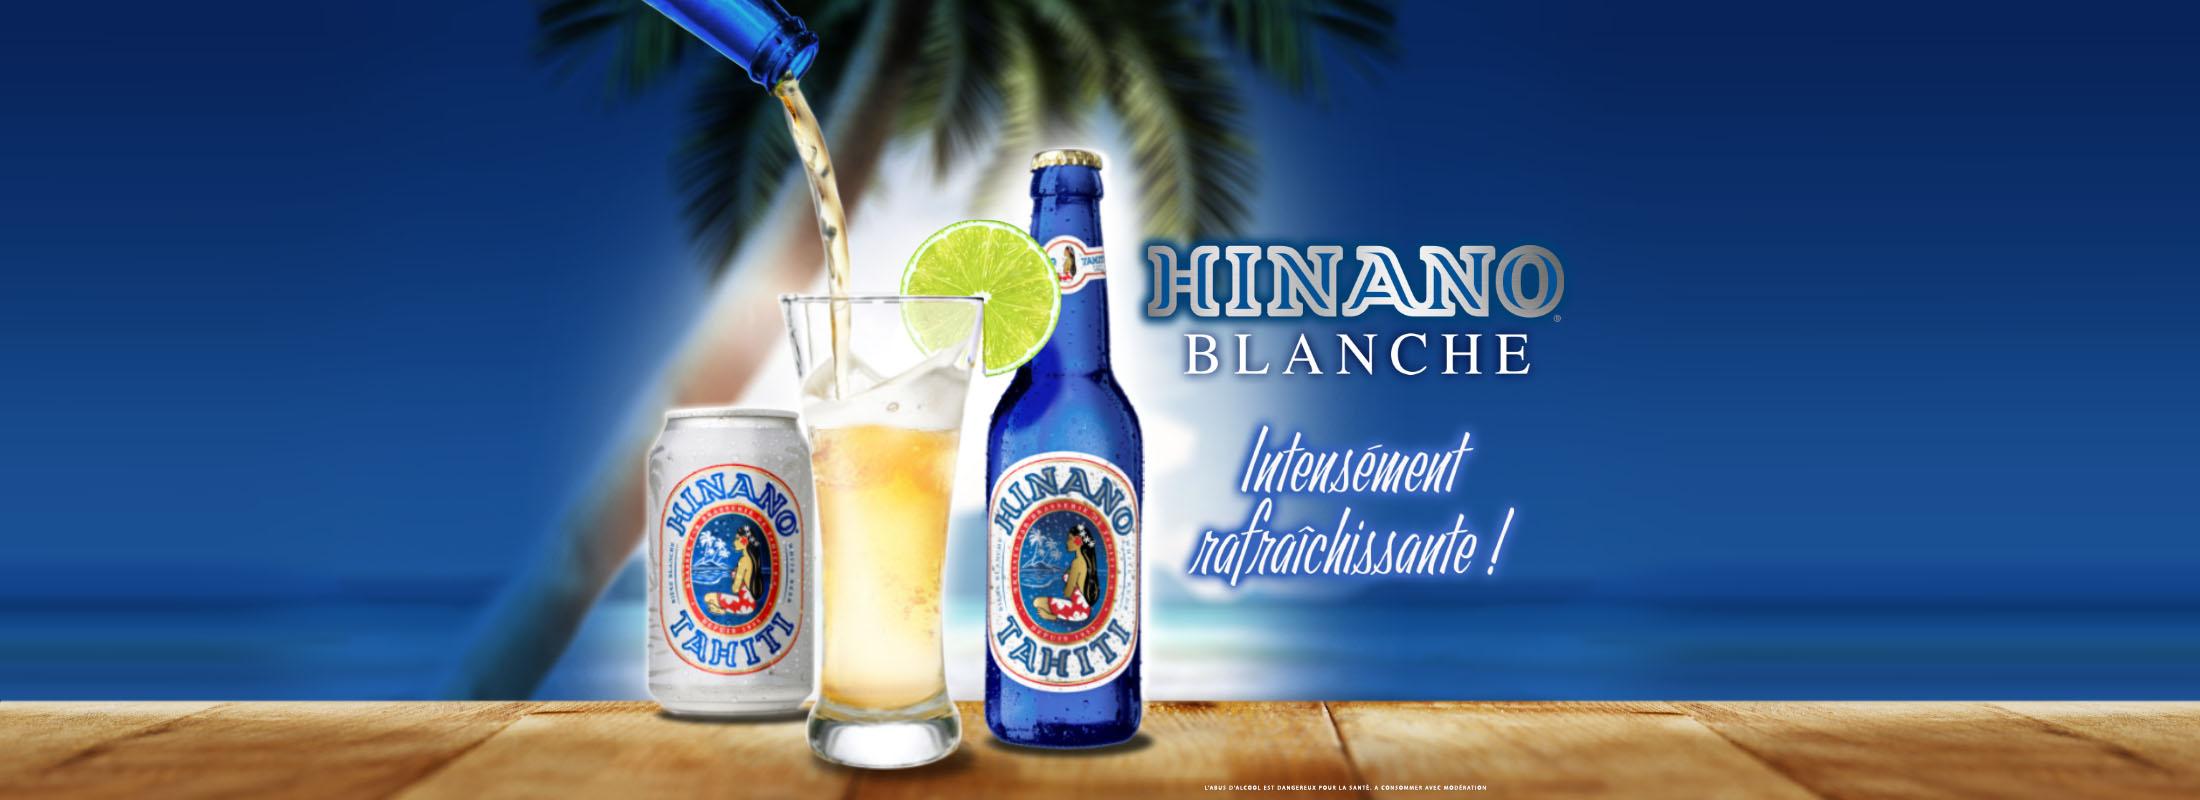 Hinano-blanche-slider-2200x800